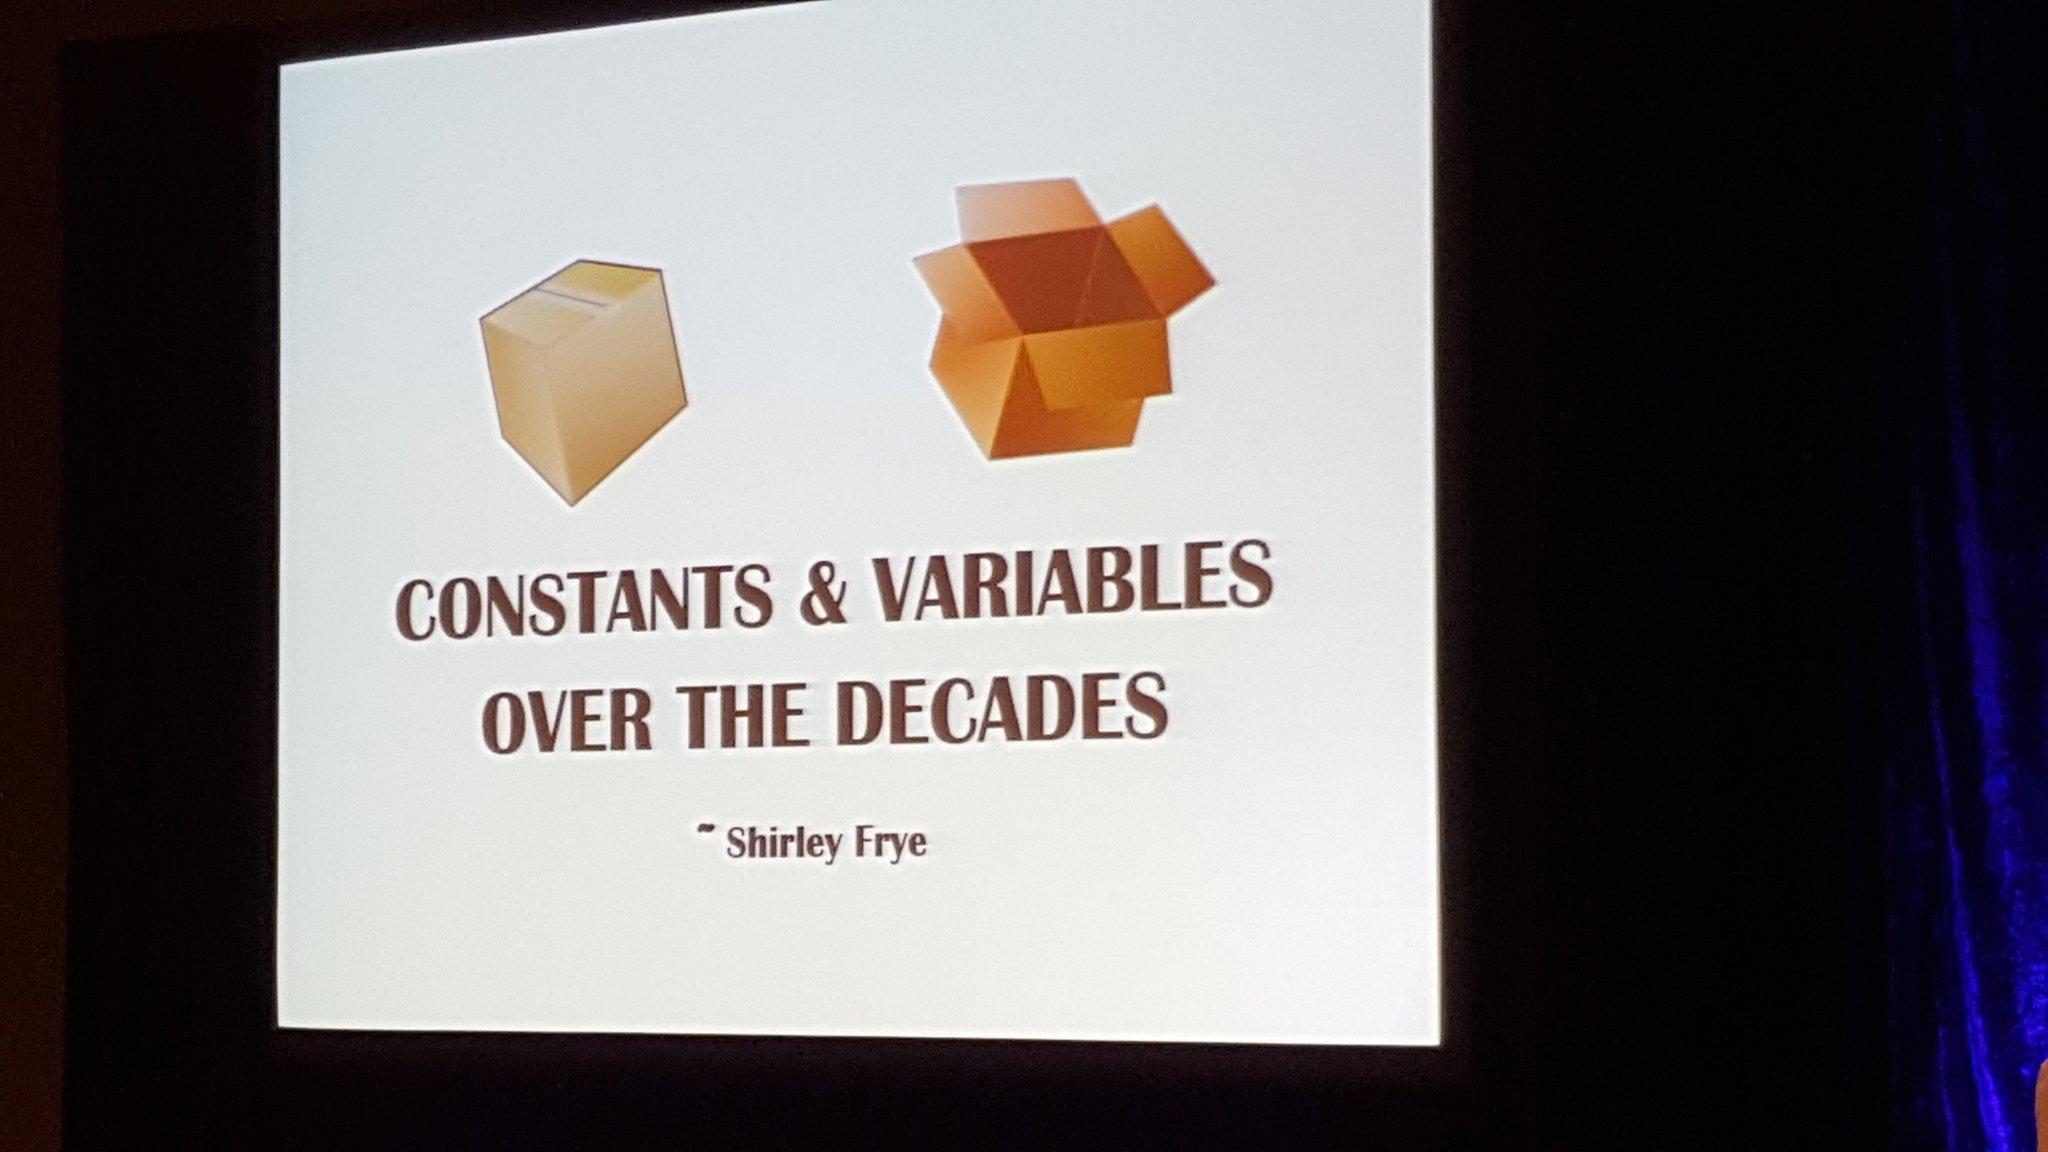 Shirley Frye has devoted her career to teaching since 1951 #NCTMregionals #presIgnite https://t.co/2YK4UkHMZn